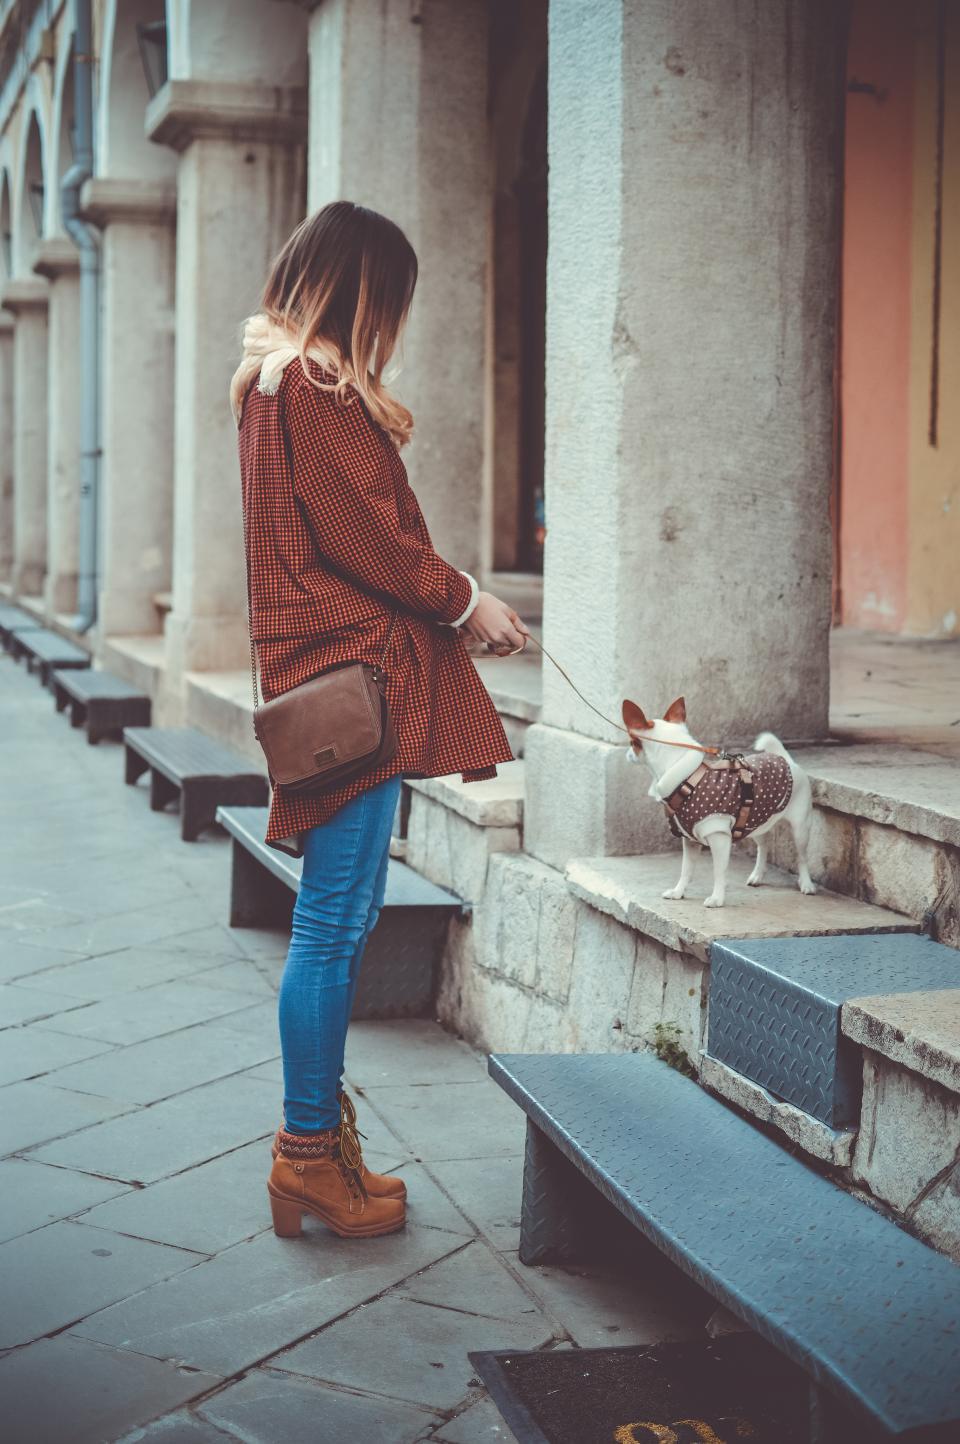 people, woman, fashion, boots, street, dog, puppy, pet, stroll